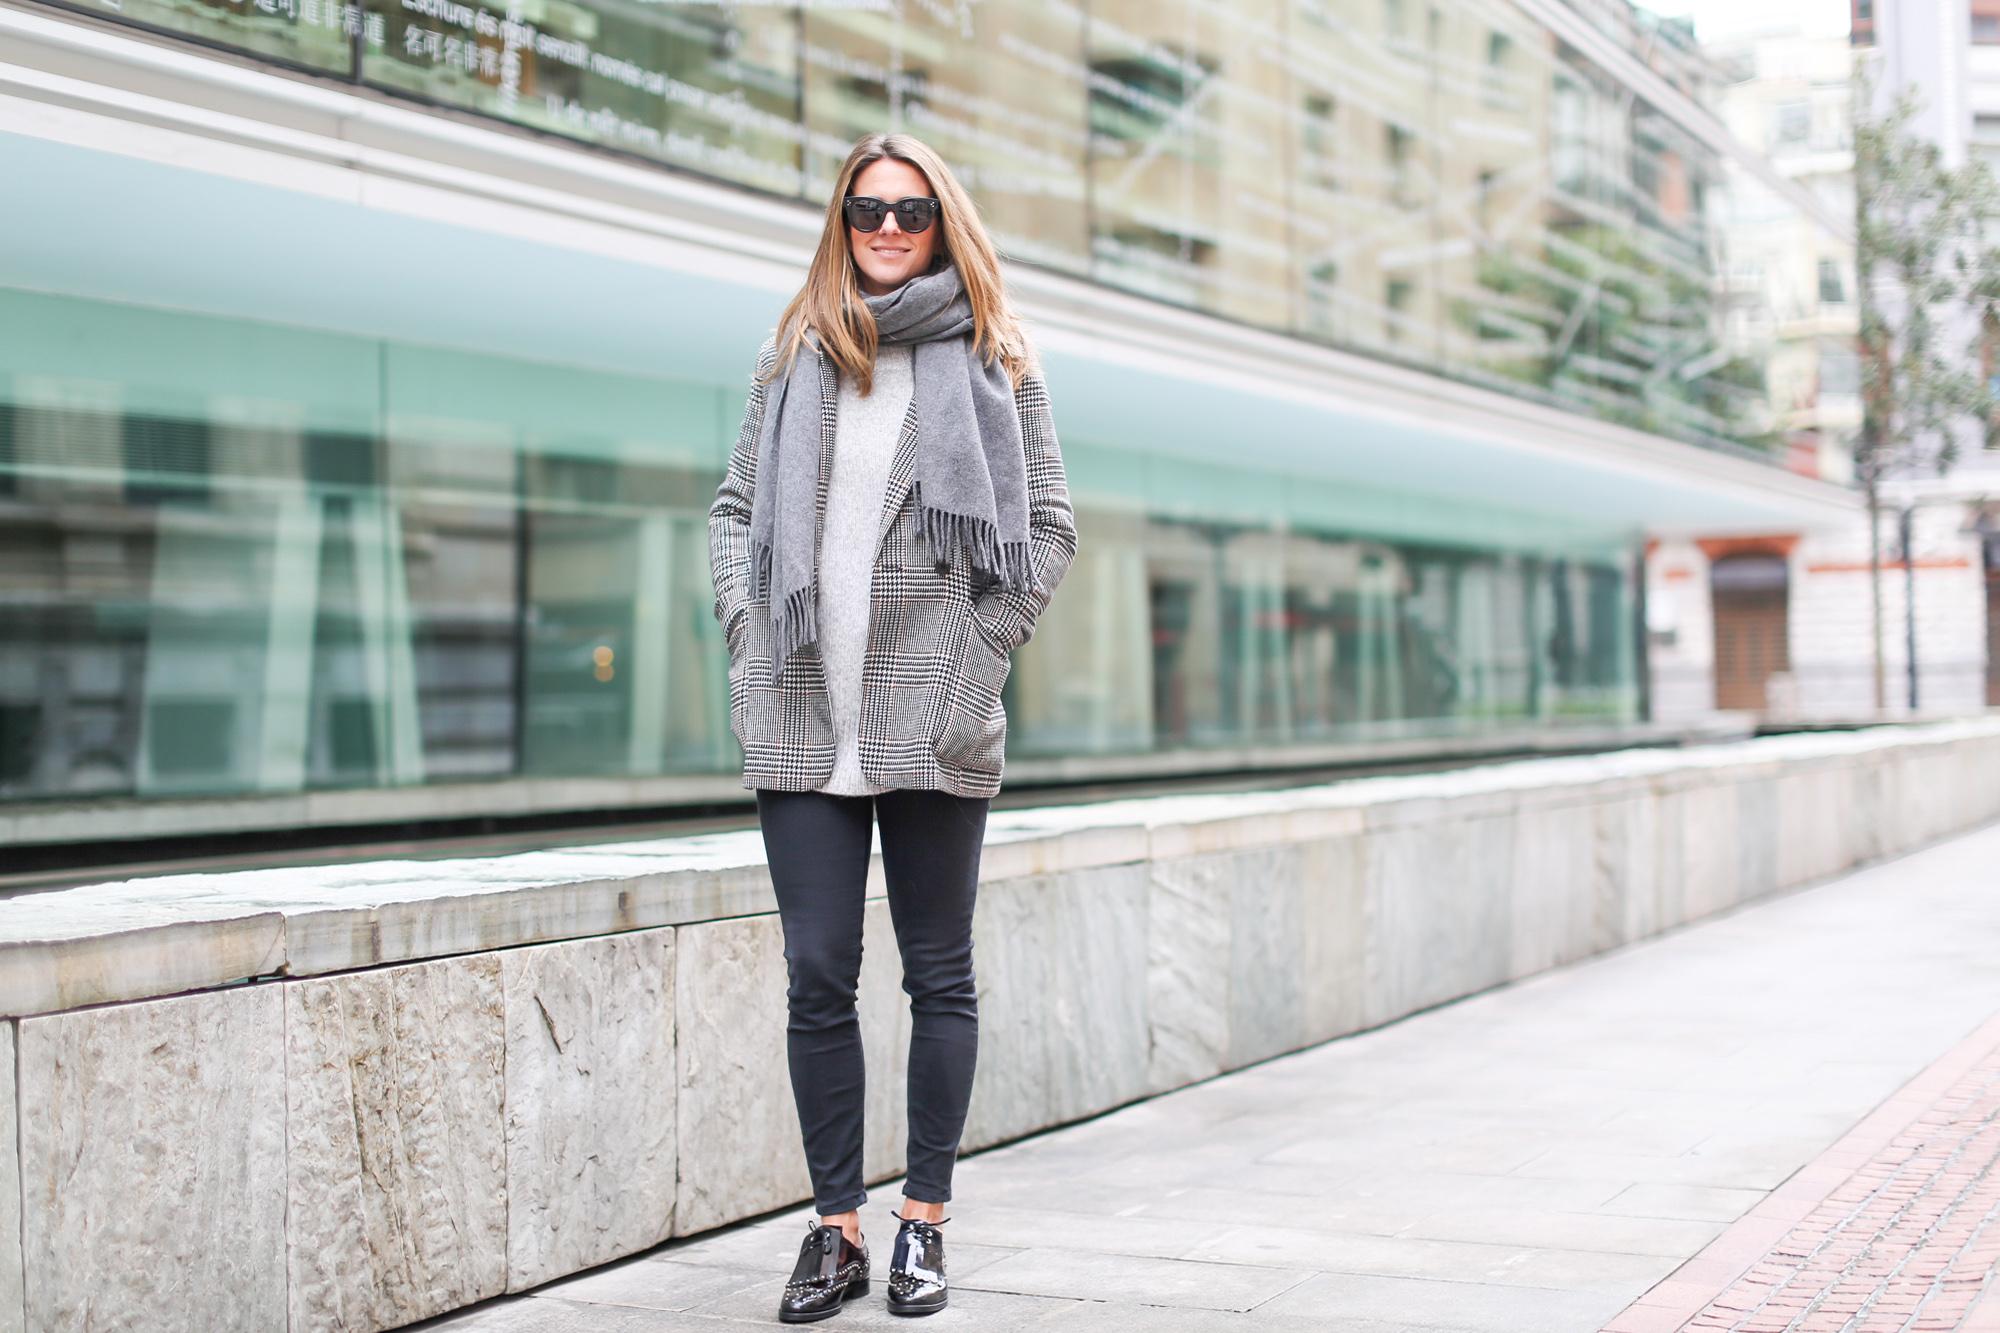 Clochet_streetstyle_fashionblogger_zapatosoxfordtachuelasPertini_bolsotangrampurificaciongarcia